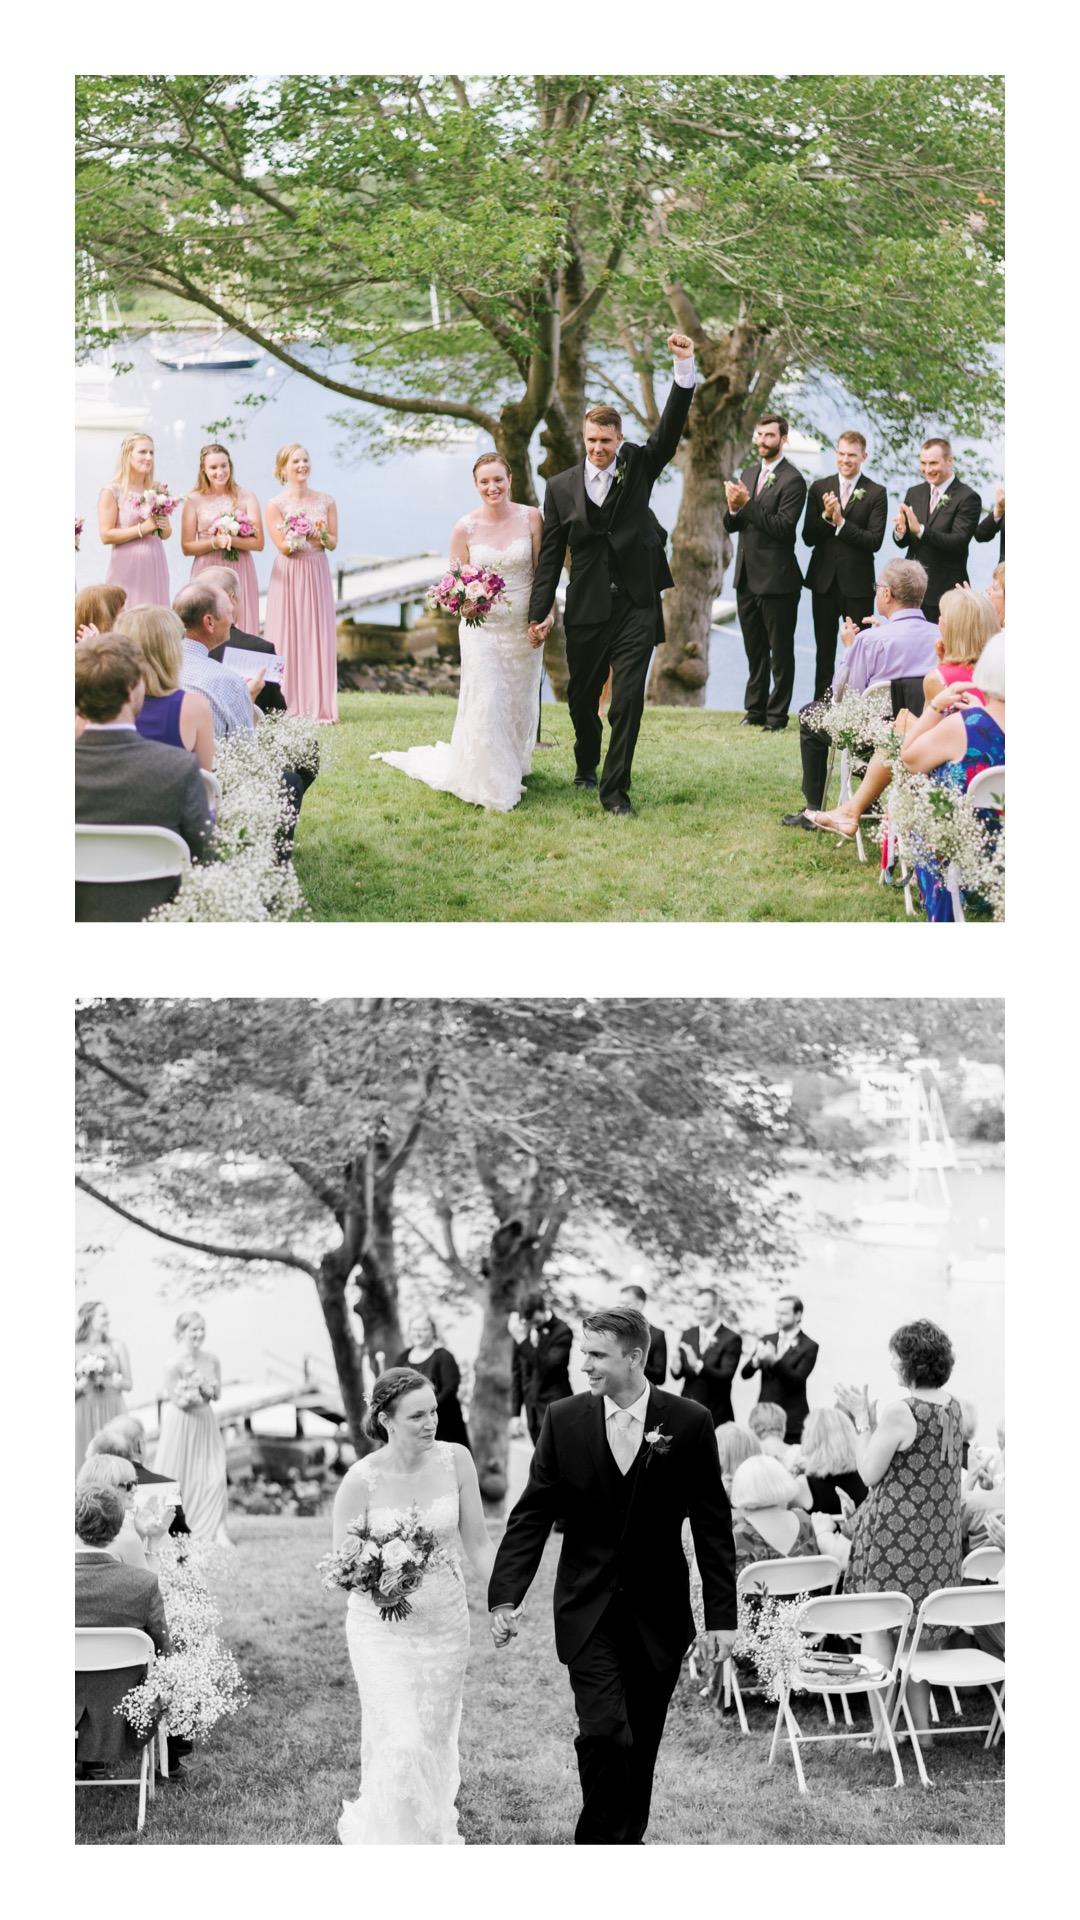 Martina & Scott Halifax Wedding Photographer - Sinead Dubeau Photography 15